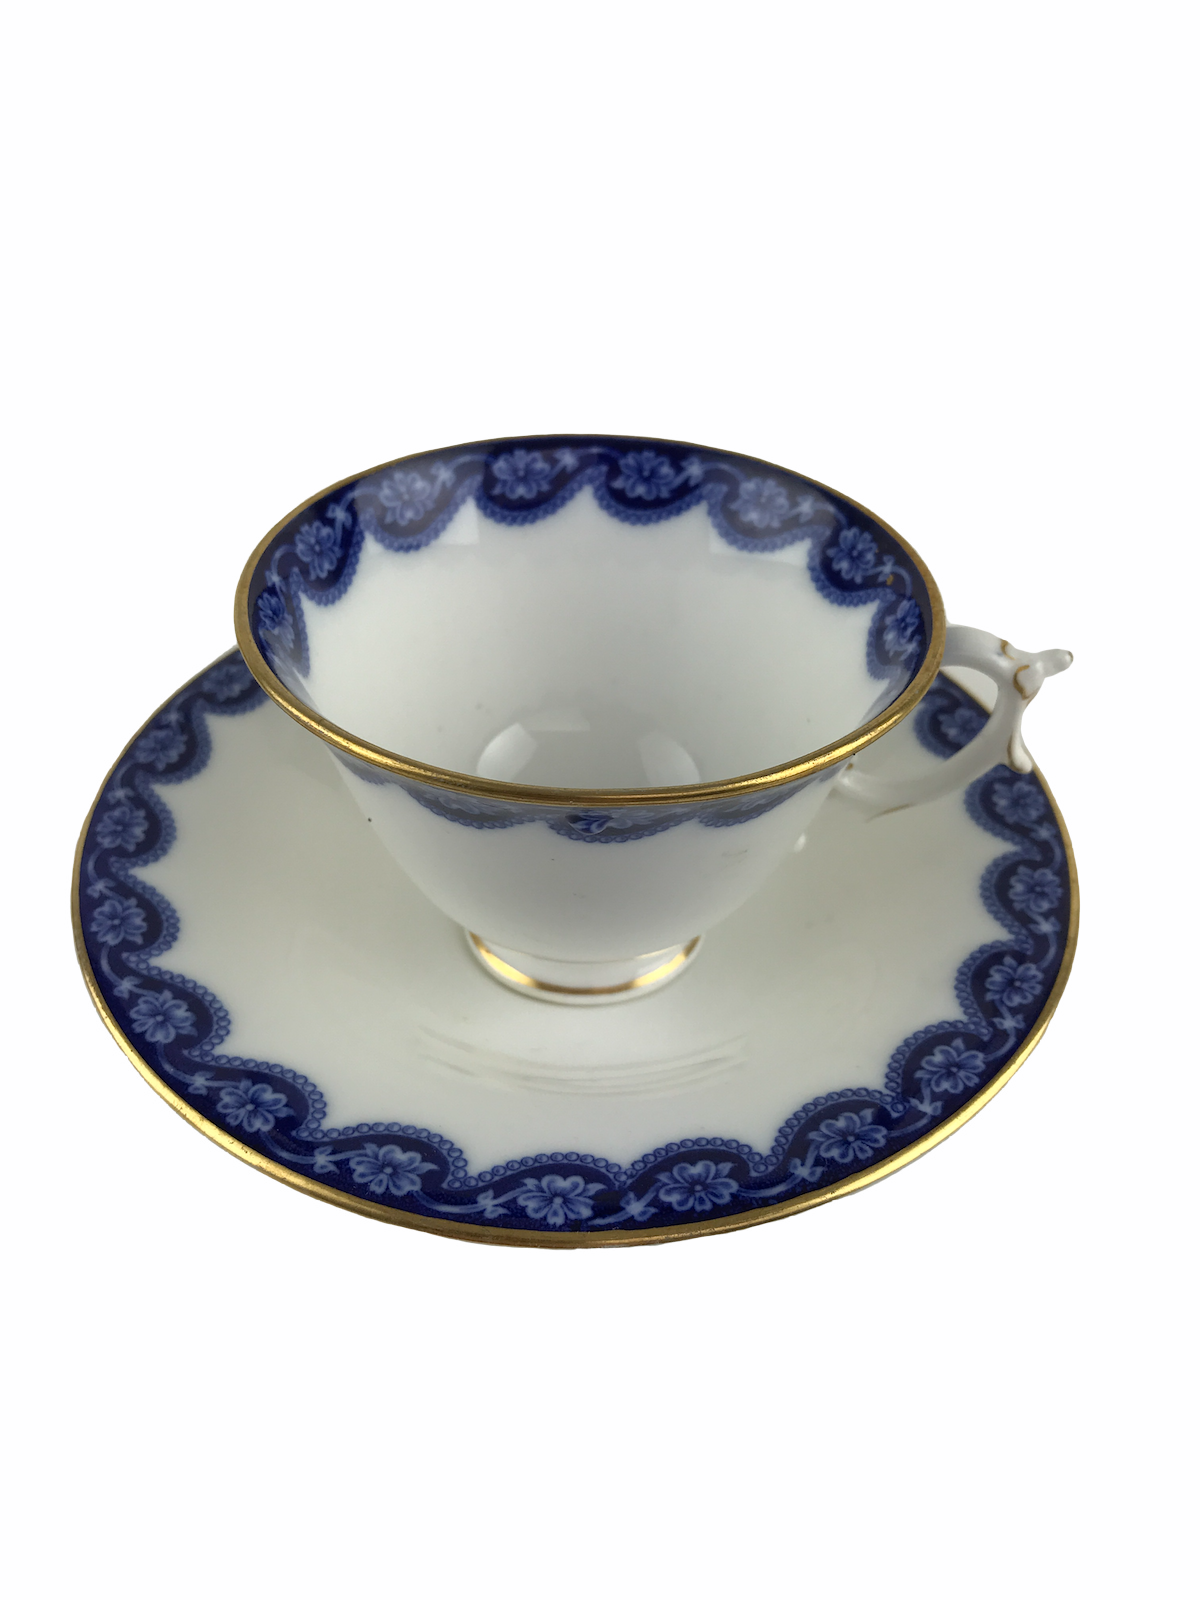 Antique 1903 Royal Worcester Bone China Cup & Saucer Cobalt Flow Blue 429400 - $37.08